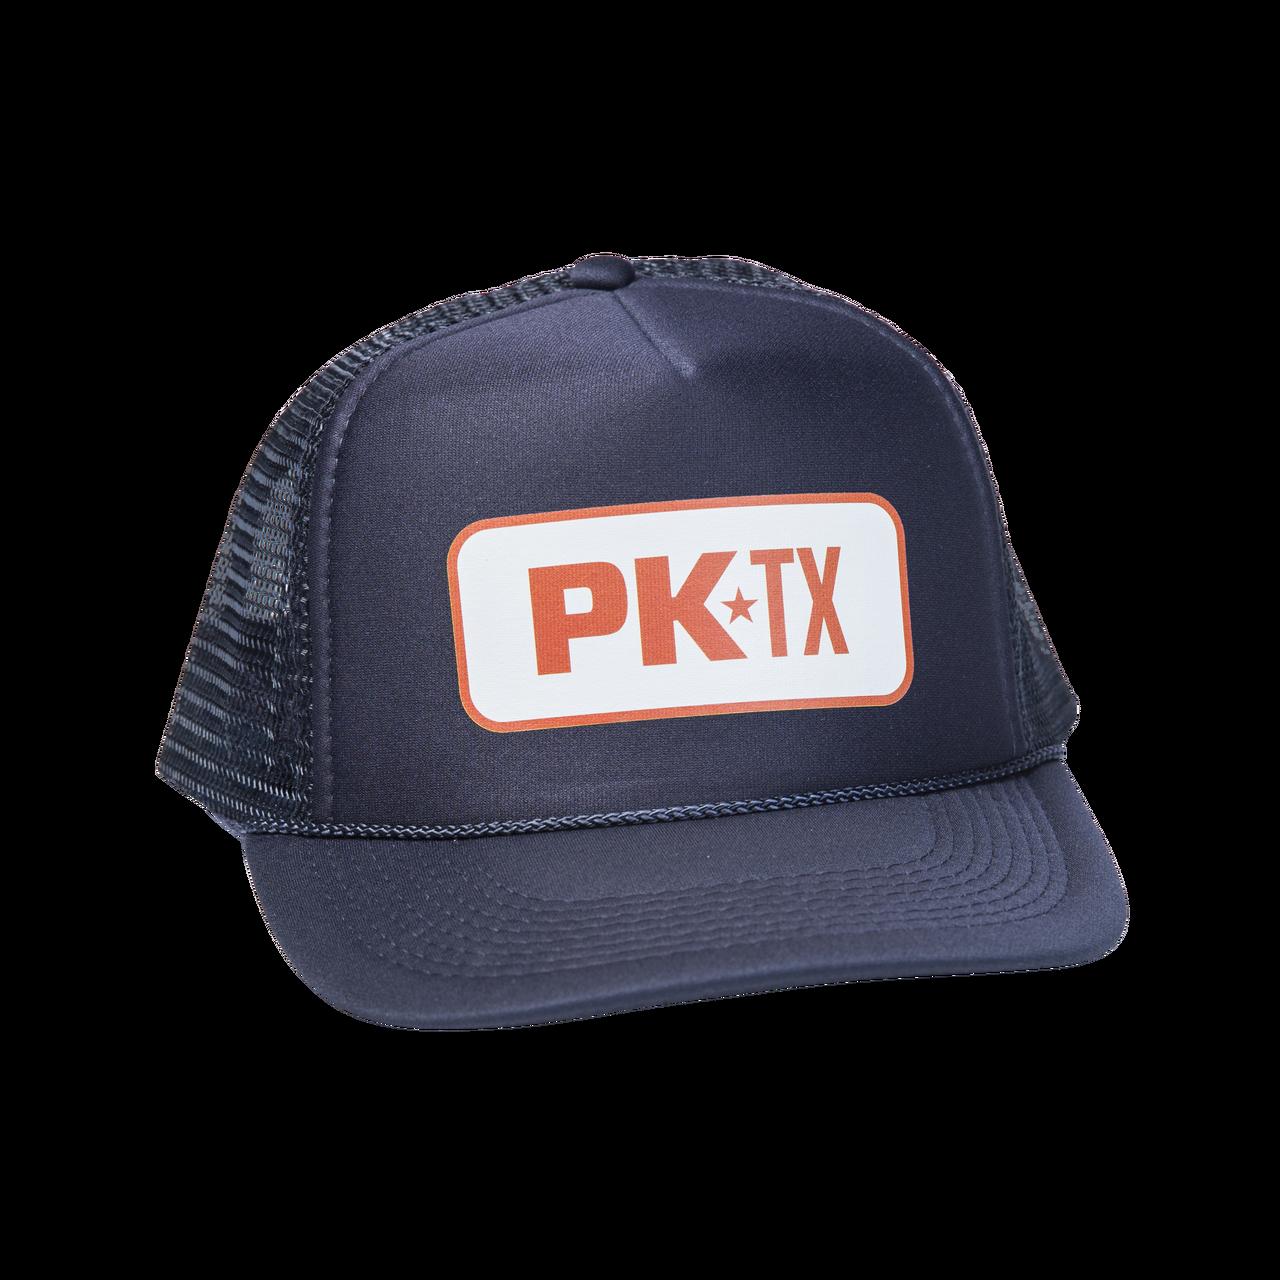 Cook Outside Summer Trucker Hat e501cfb2ce4